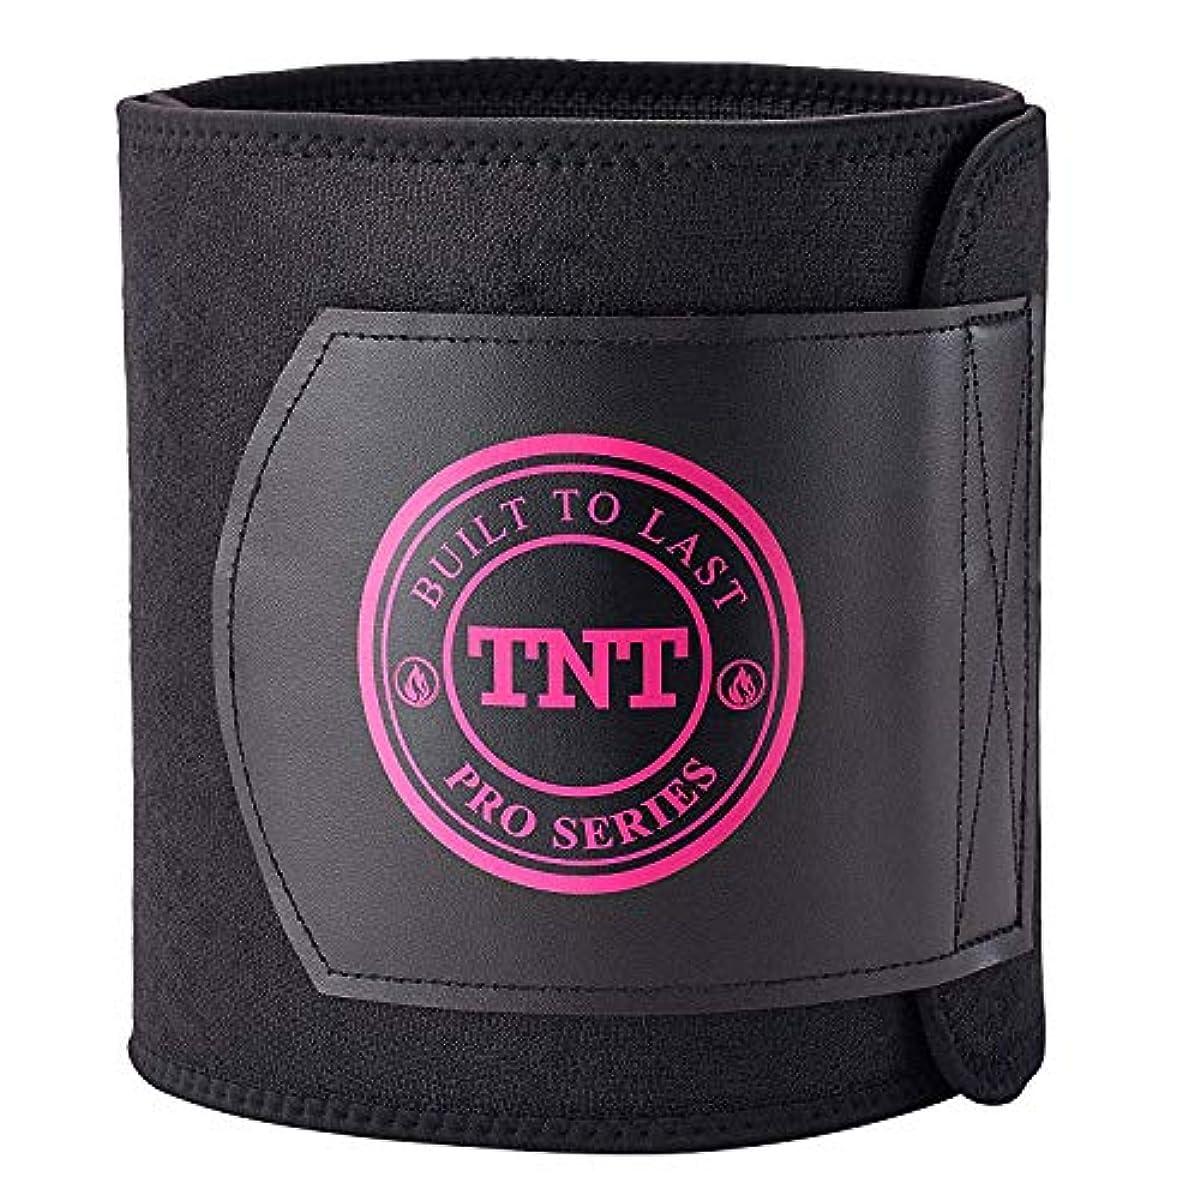 9fb7c24cb6 Details about TNT Pro Series Waist Trimmer Weight Loss Ab Belt Premium  Stomach Fat Burner Wrap